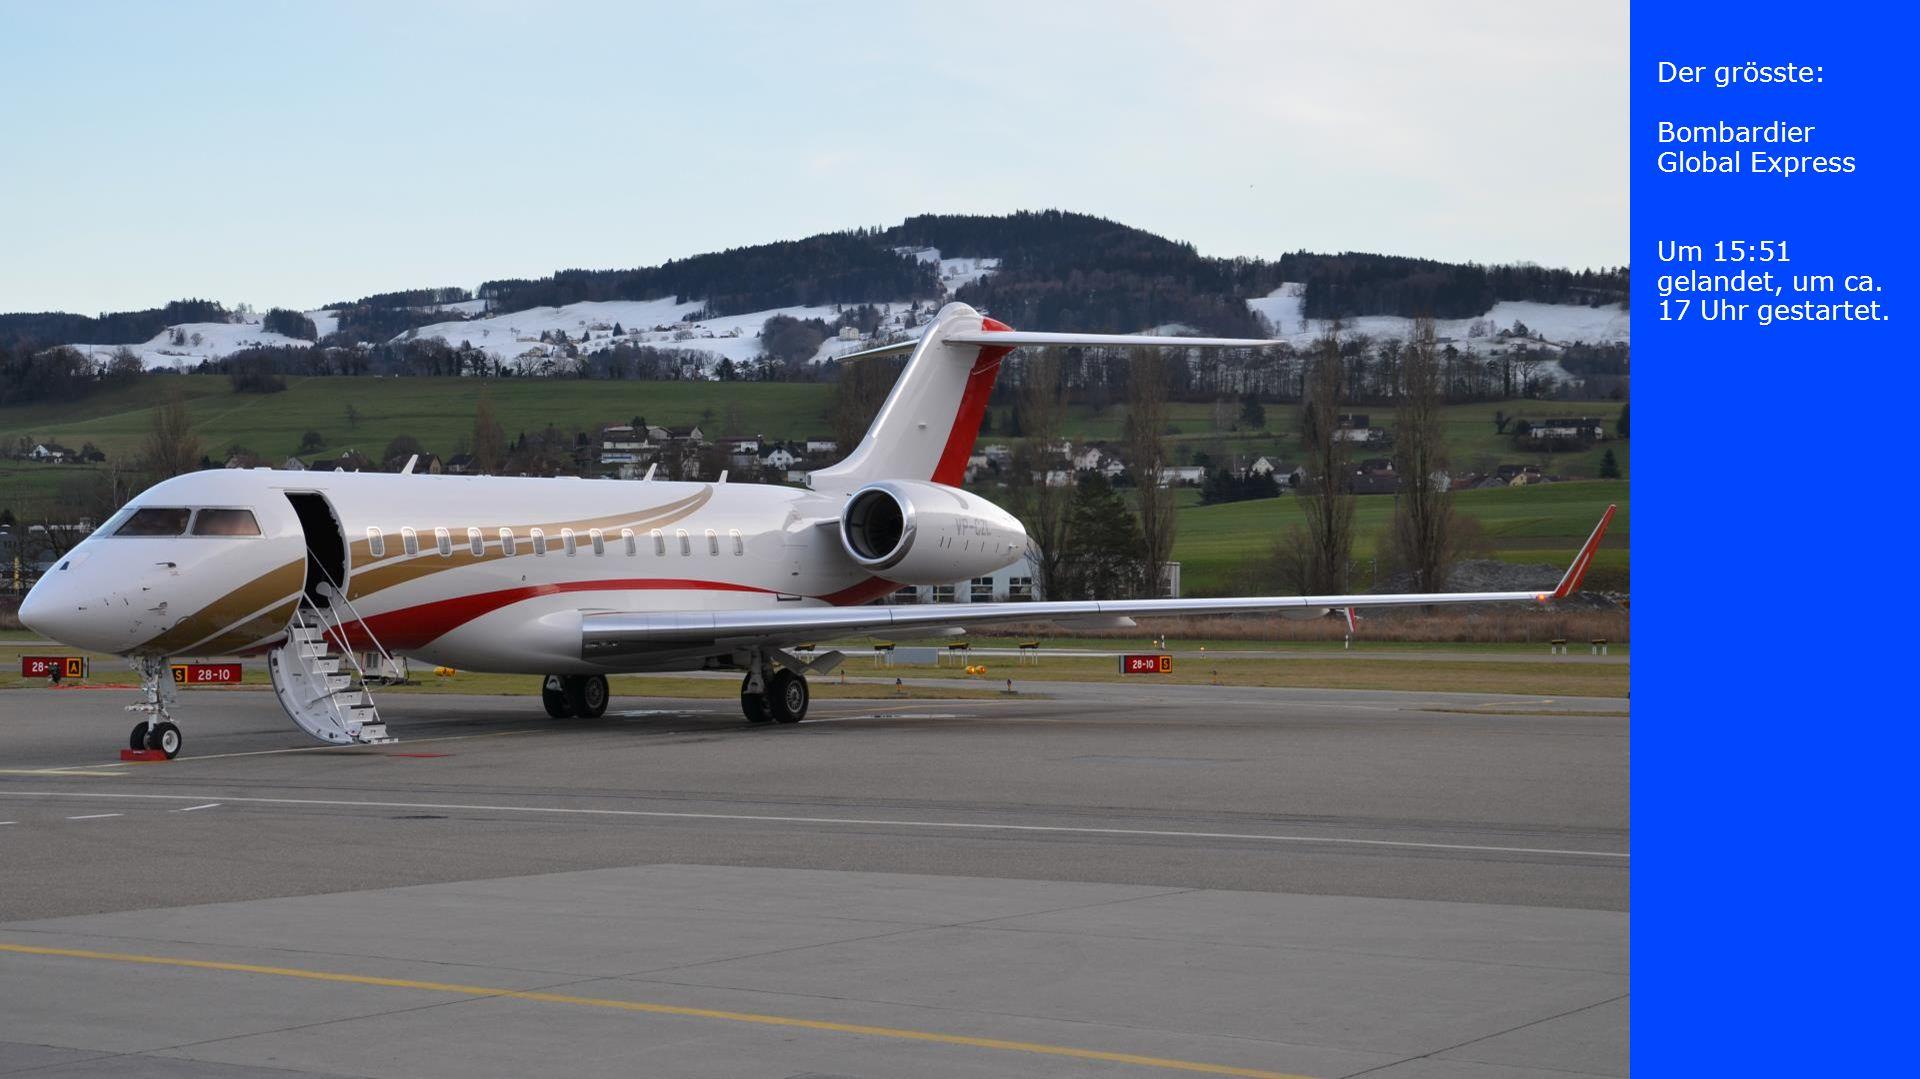 Der grösste: Bombardier Global Express Um 15:51 gelandet, um ca. 17 Uhr gestartet.